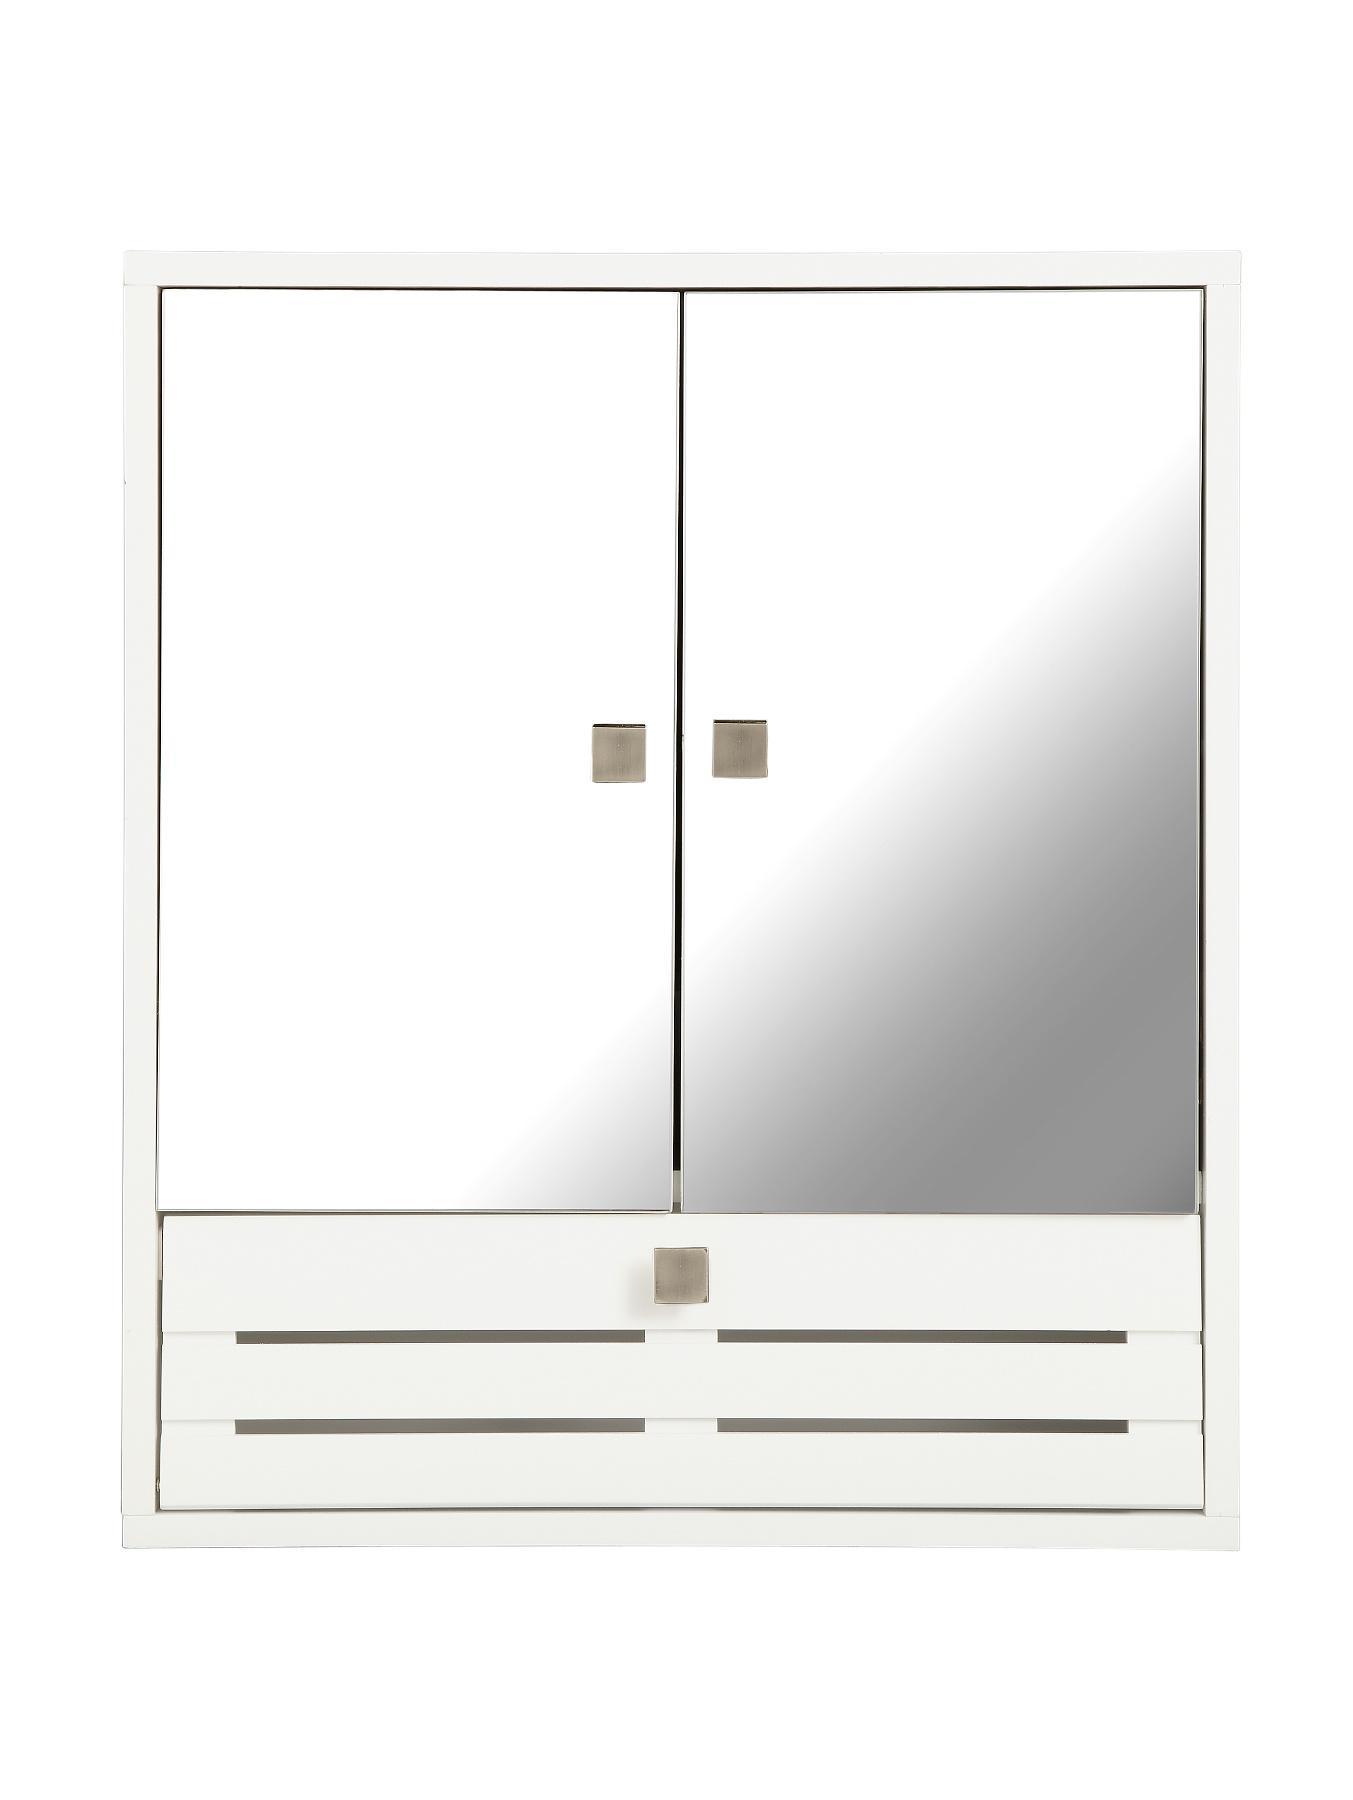 slatted 3 door mirrored bathroom cabinet white slatted 3 door mirrored